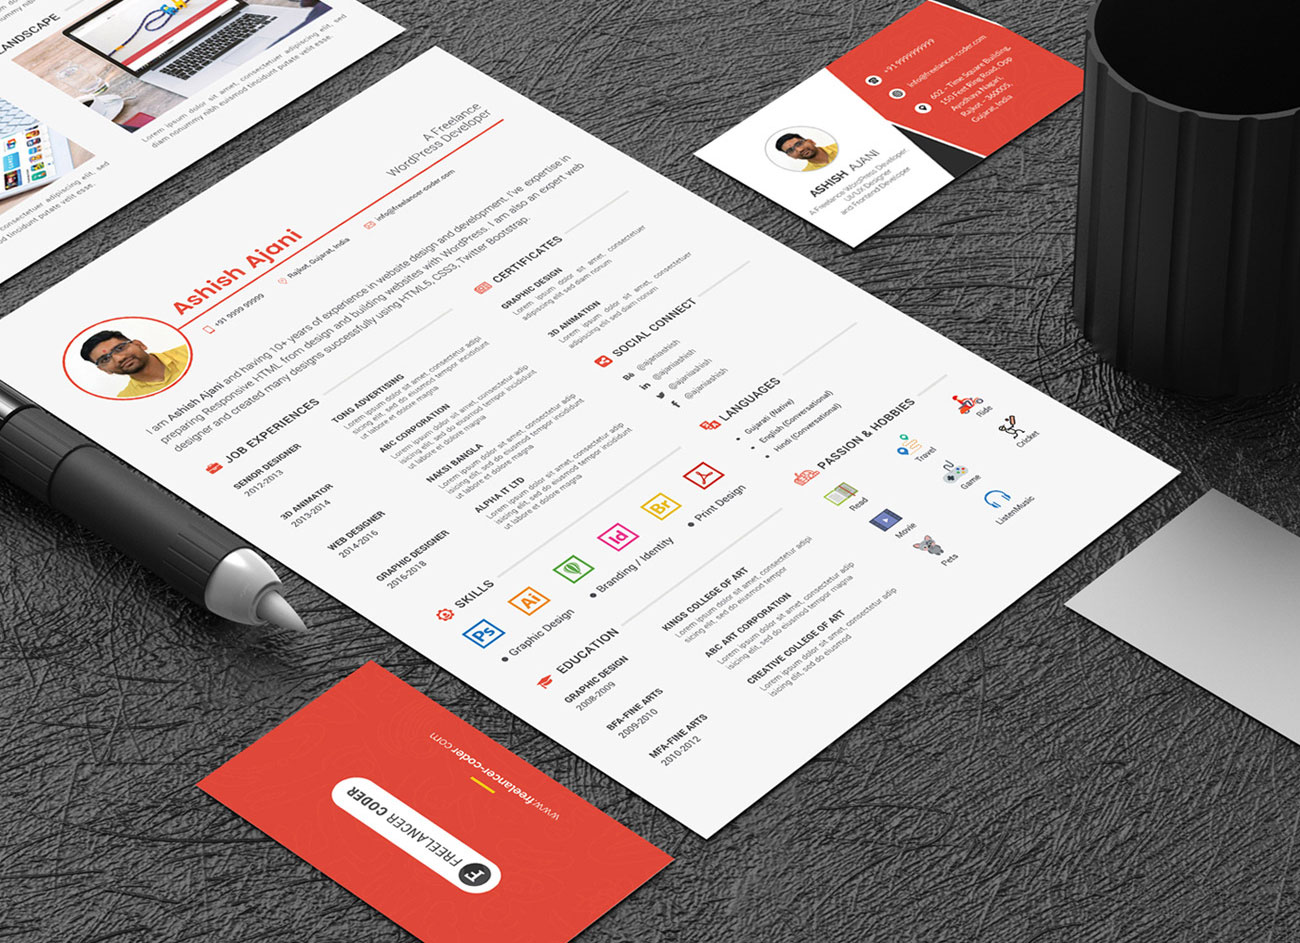 Free-PSD-Resume-Template-&-Cover-Letter-for-PHP-&-Wordpress-Developer-5